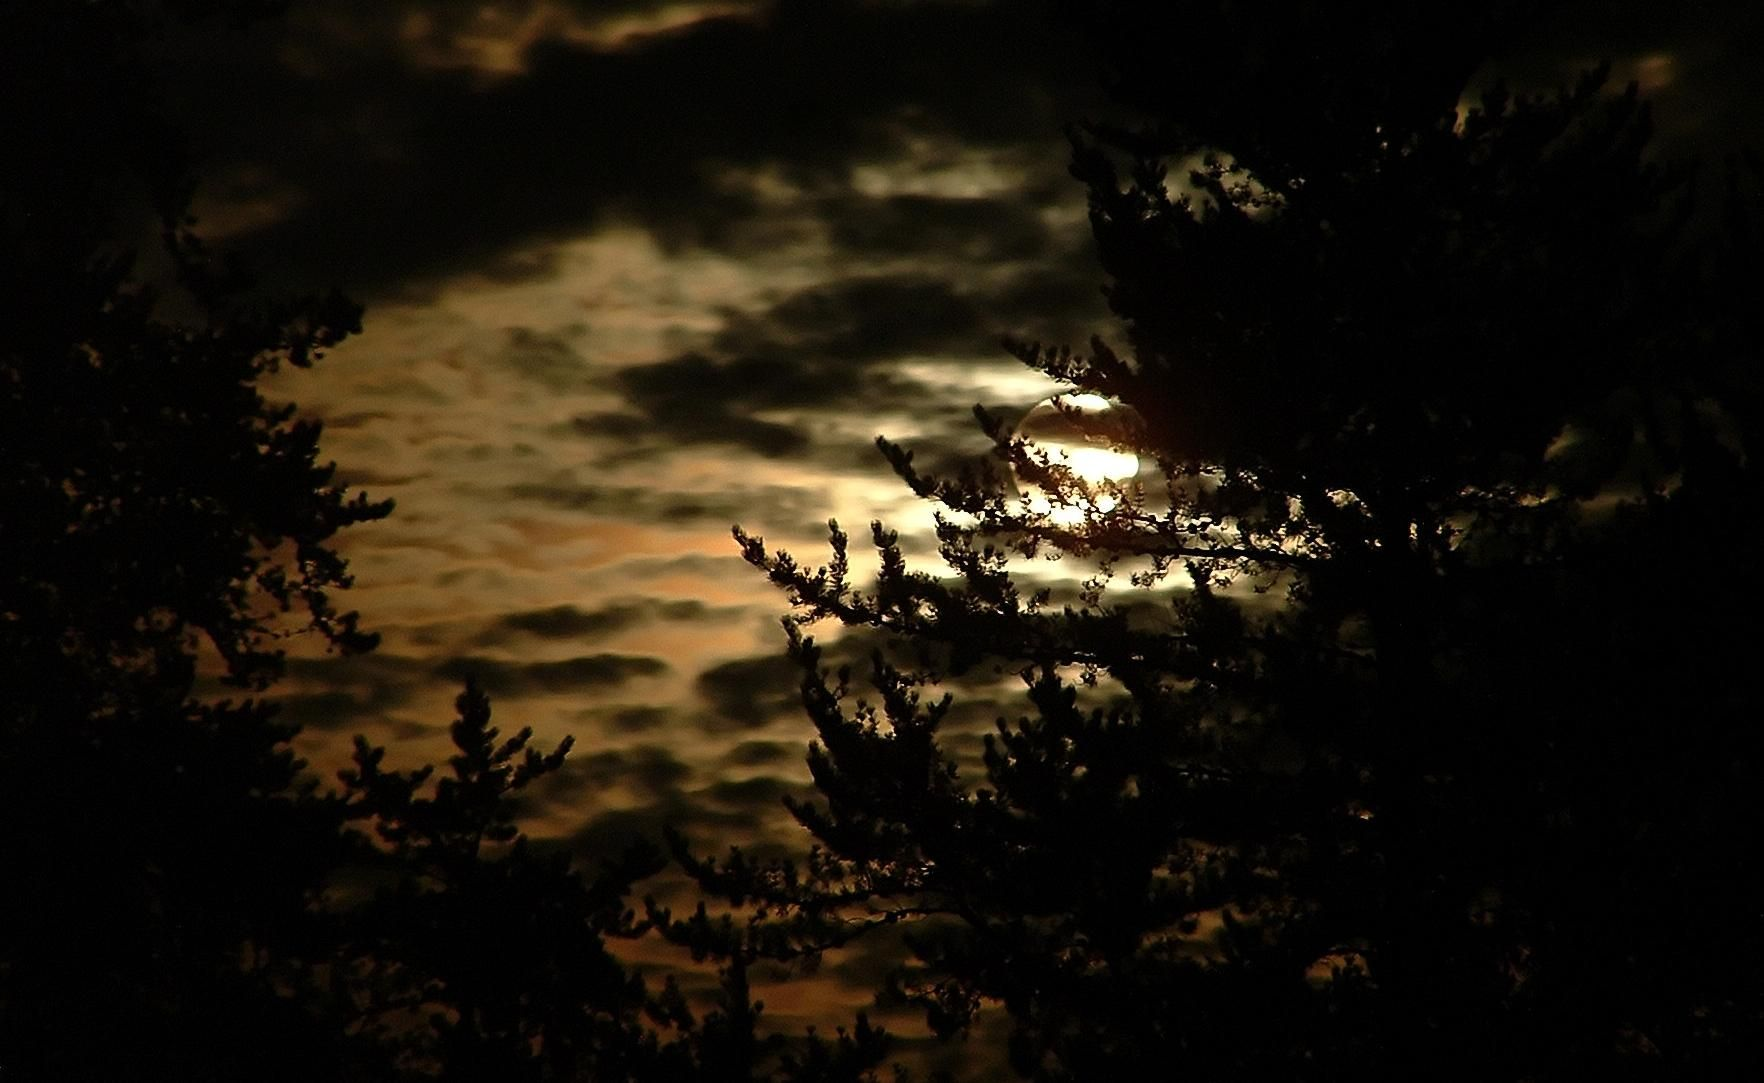 byron darkness